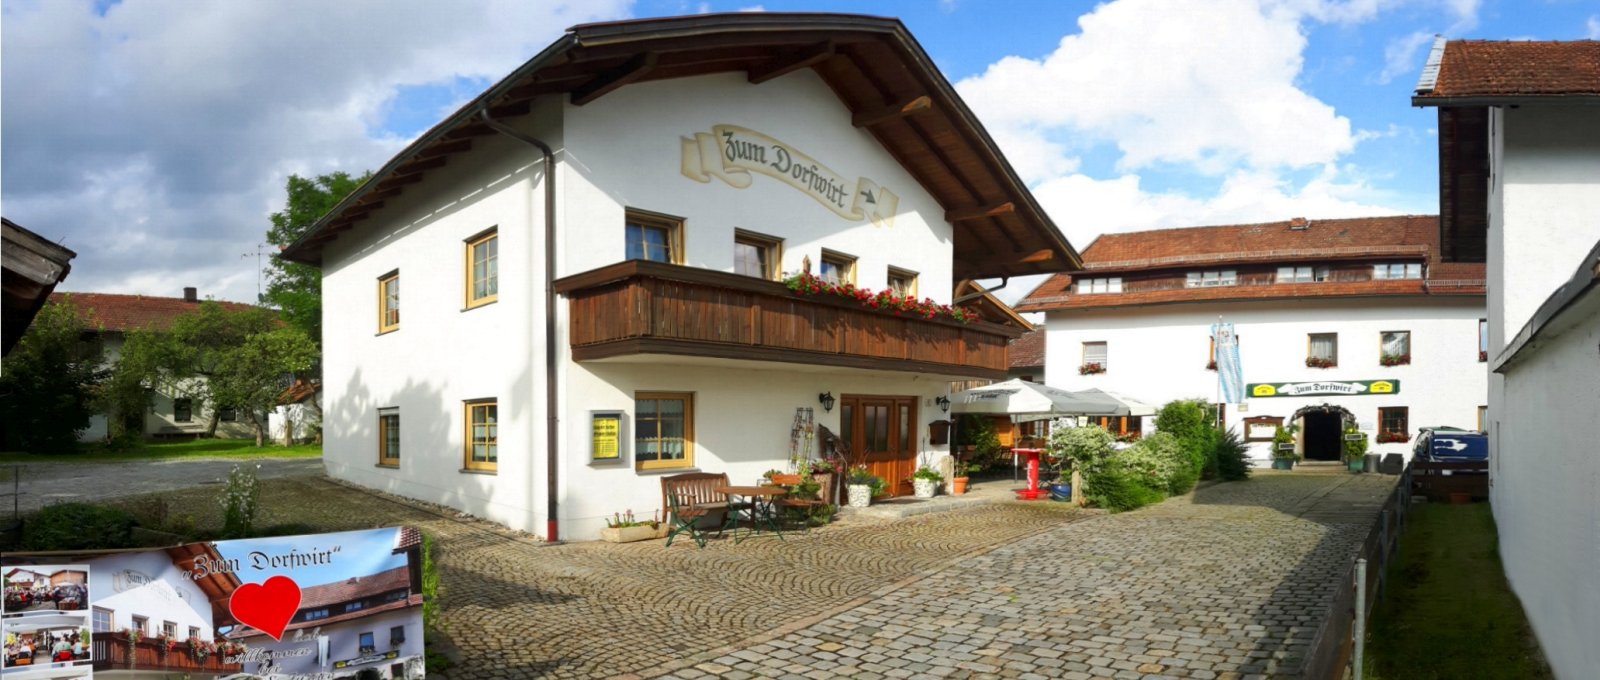 Gasthof in Arnbruck beliebtes Ausflugslokal Bayerischer Wald in Arnbruck